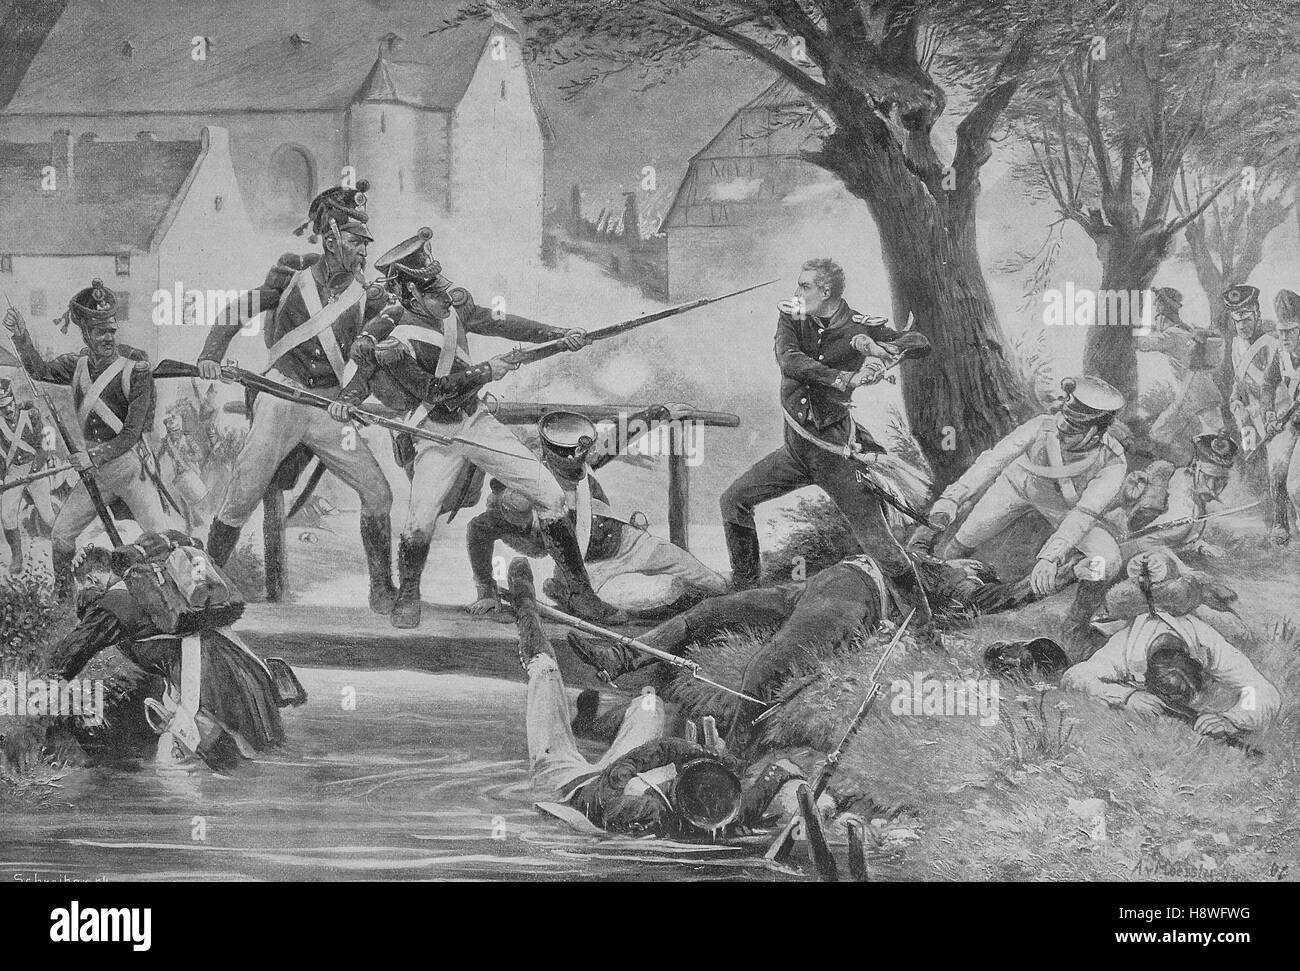 Bogislav Friedrich August von Schmeling at the Battle of Ligny (16 June 1815) - Stock Image